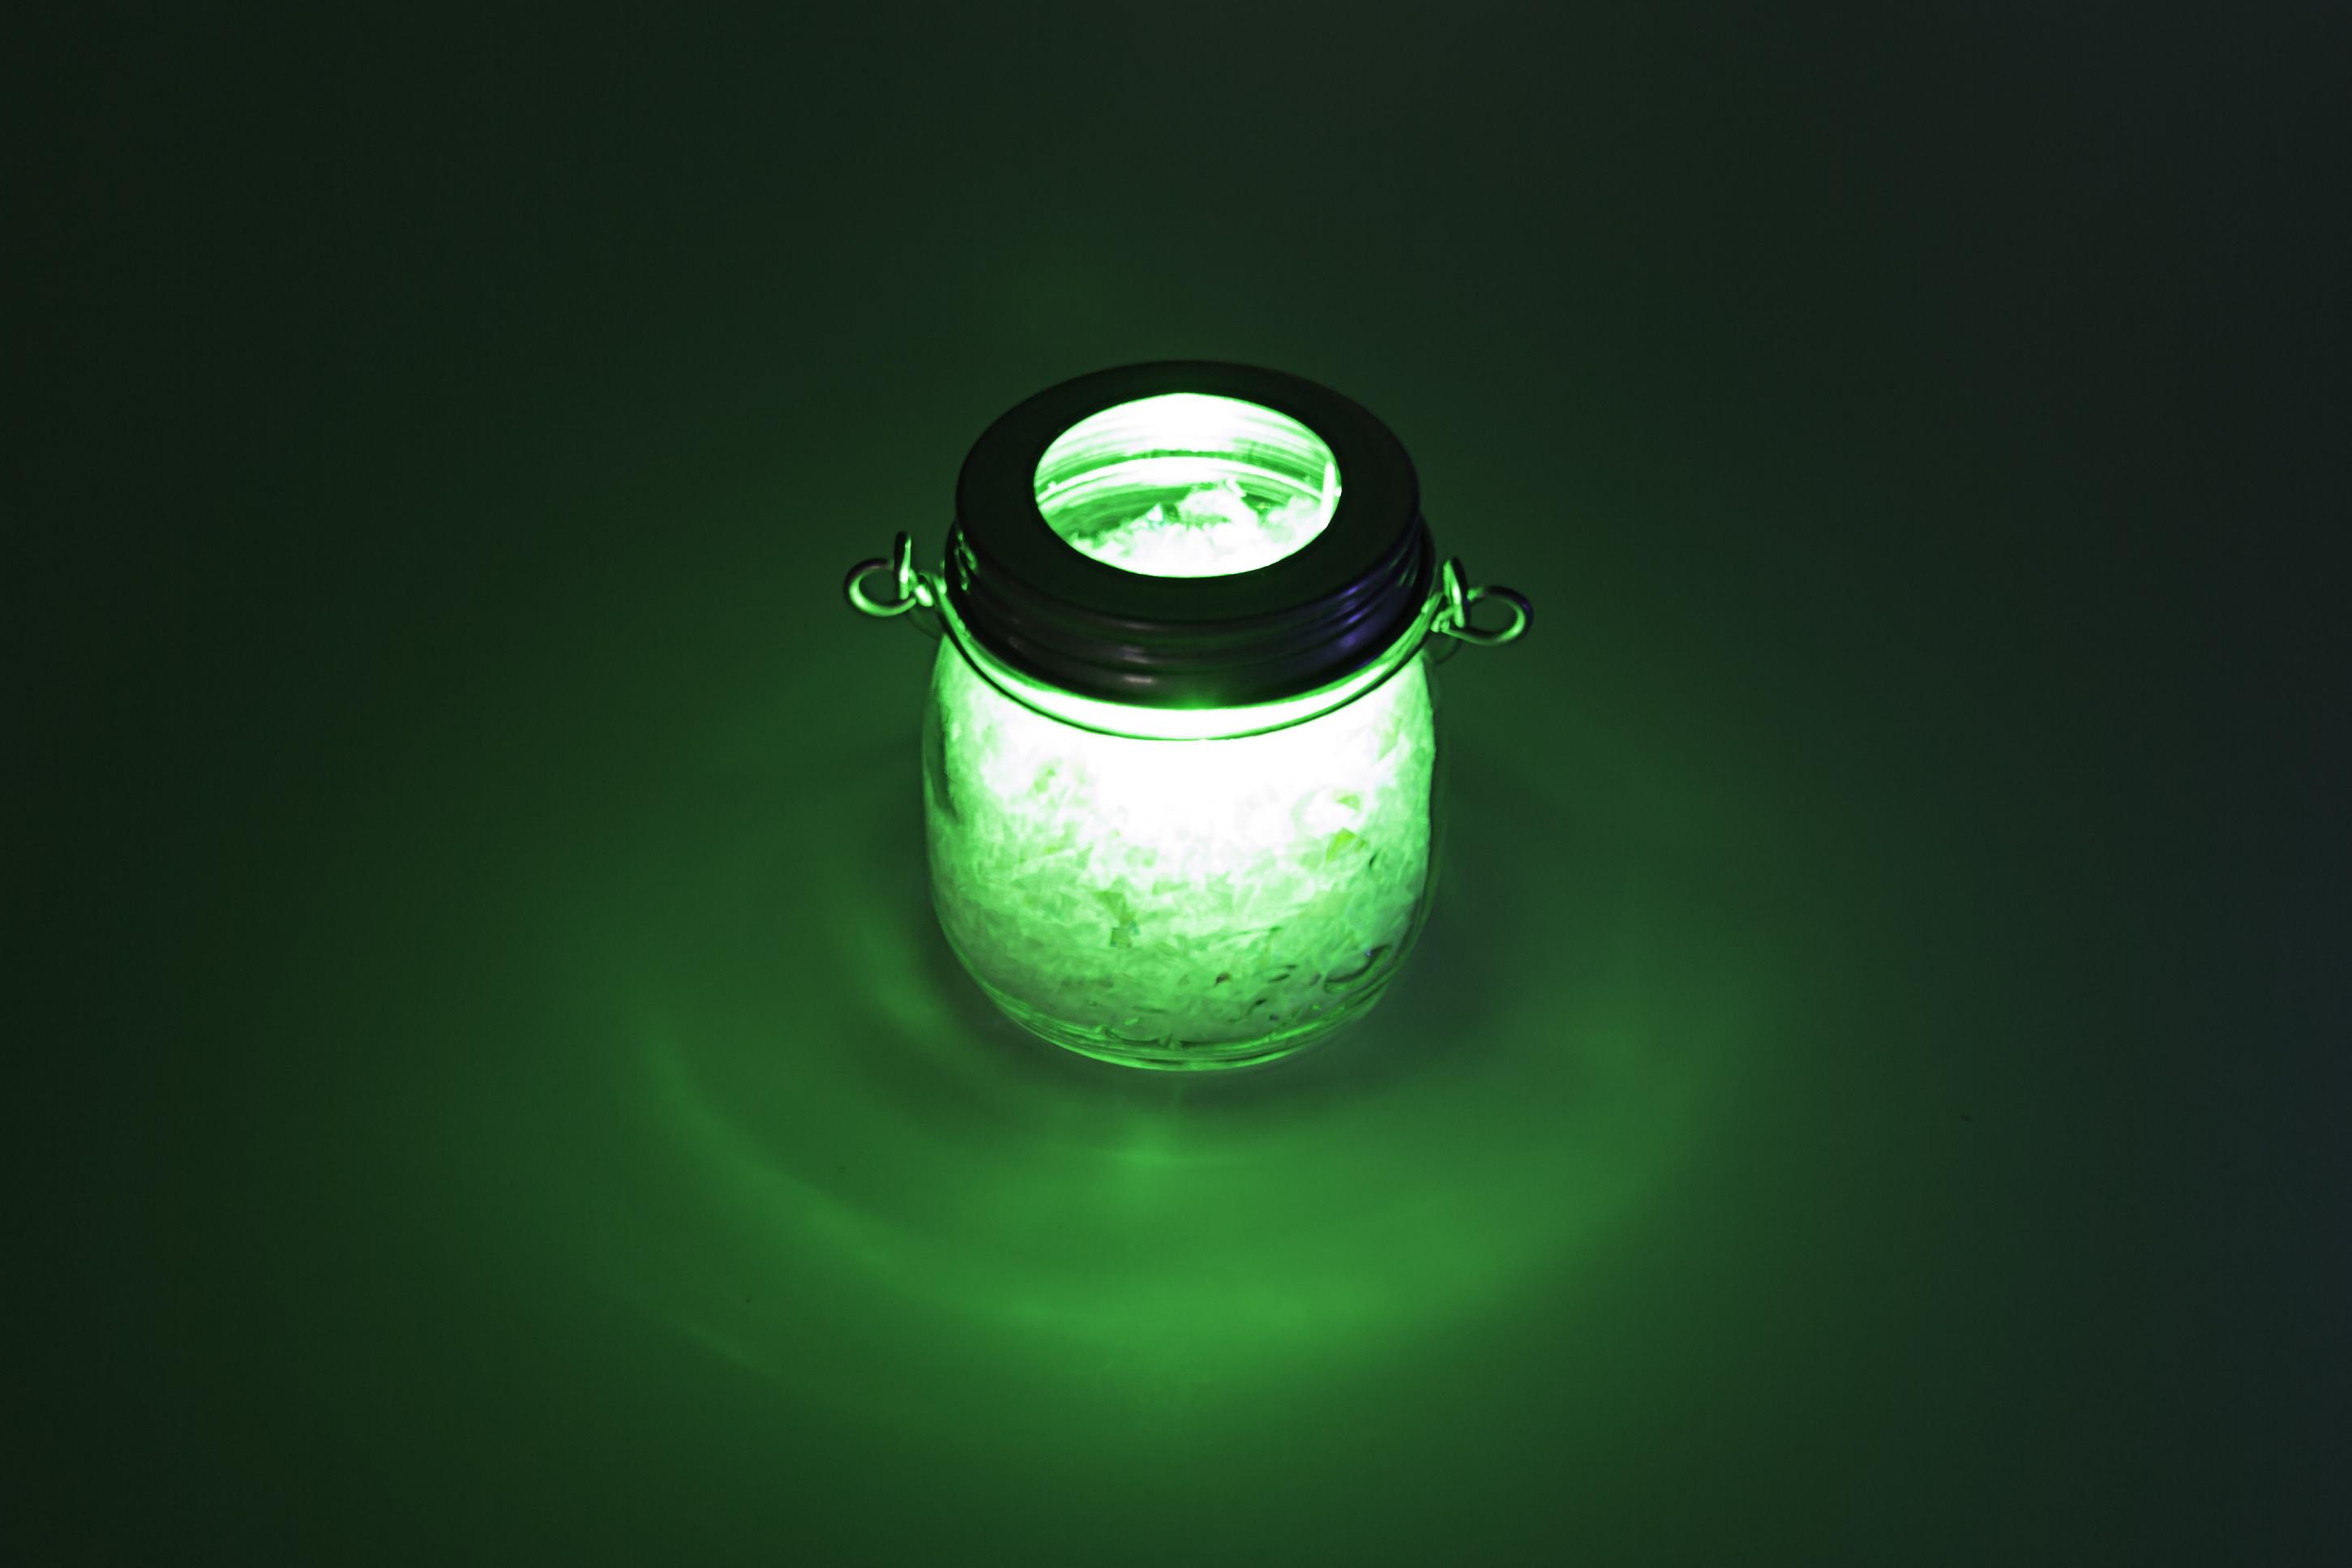 Christmas crafts - decorative LED christmas lantern with LED tea light